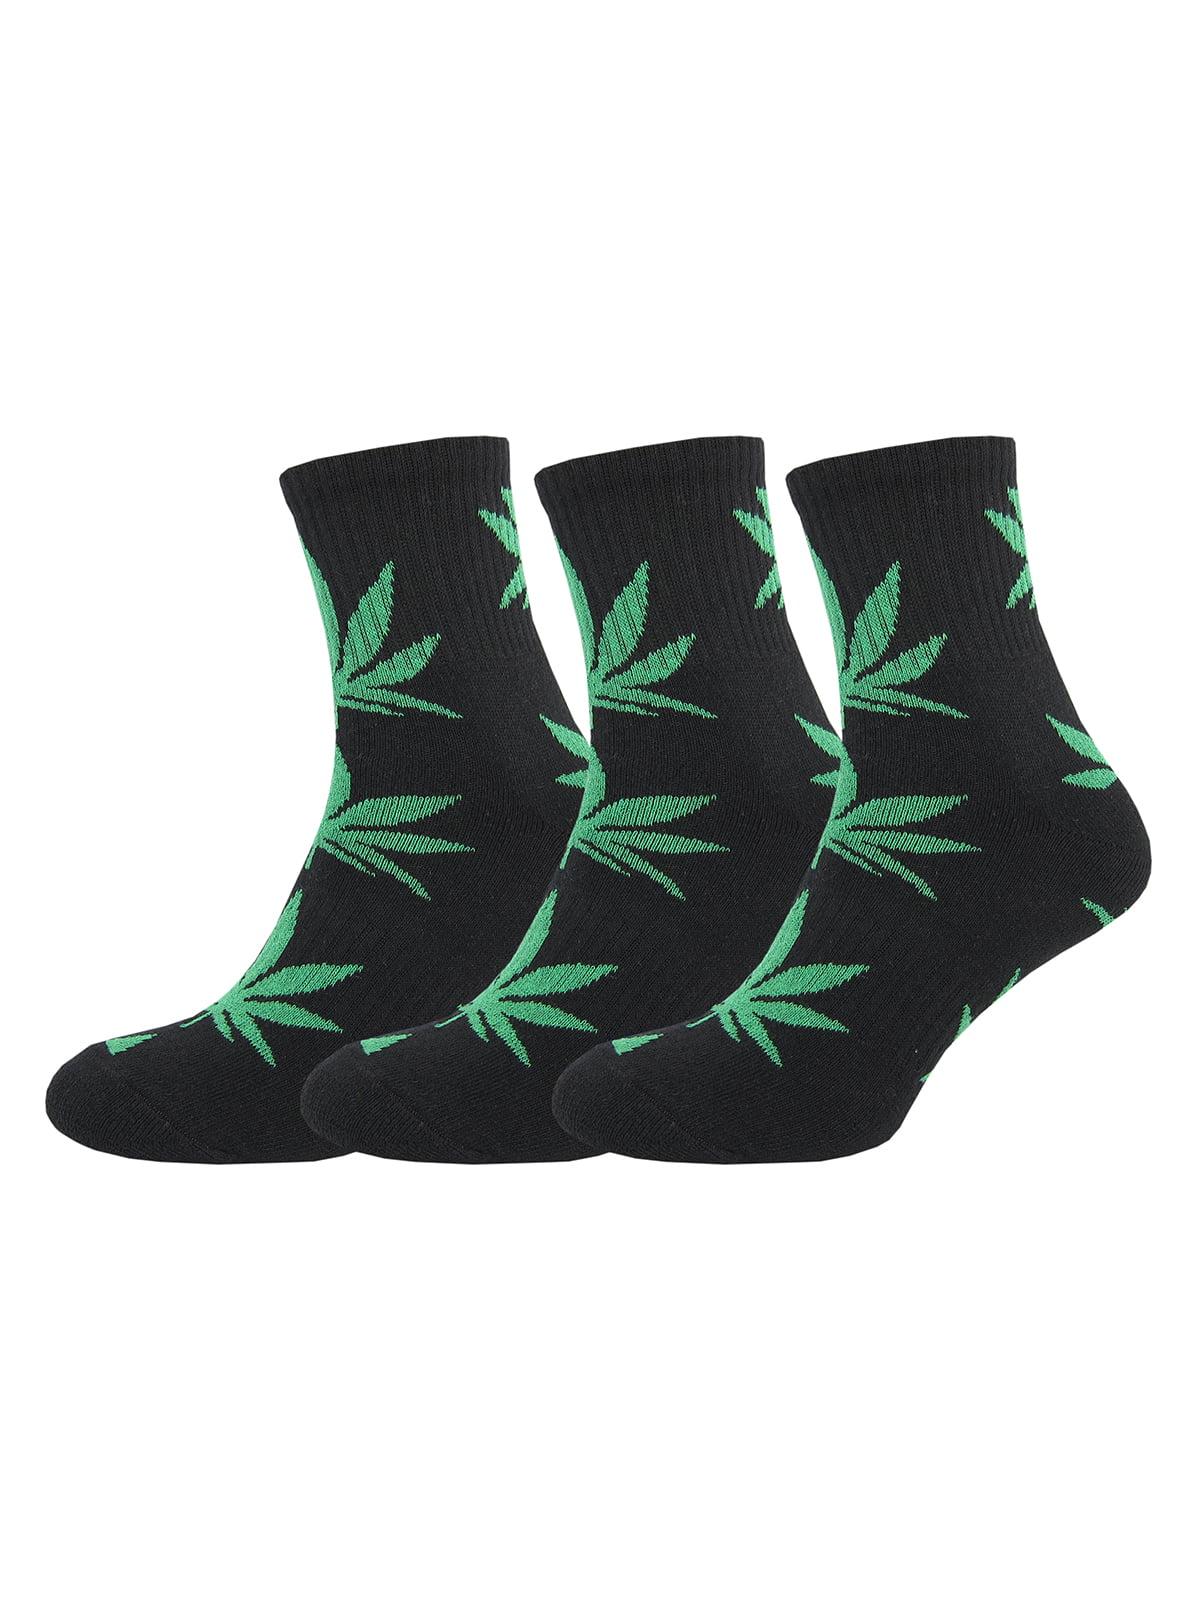 Набір шкарпеток (3 пари)   4906022